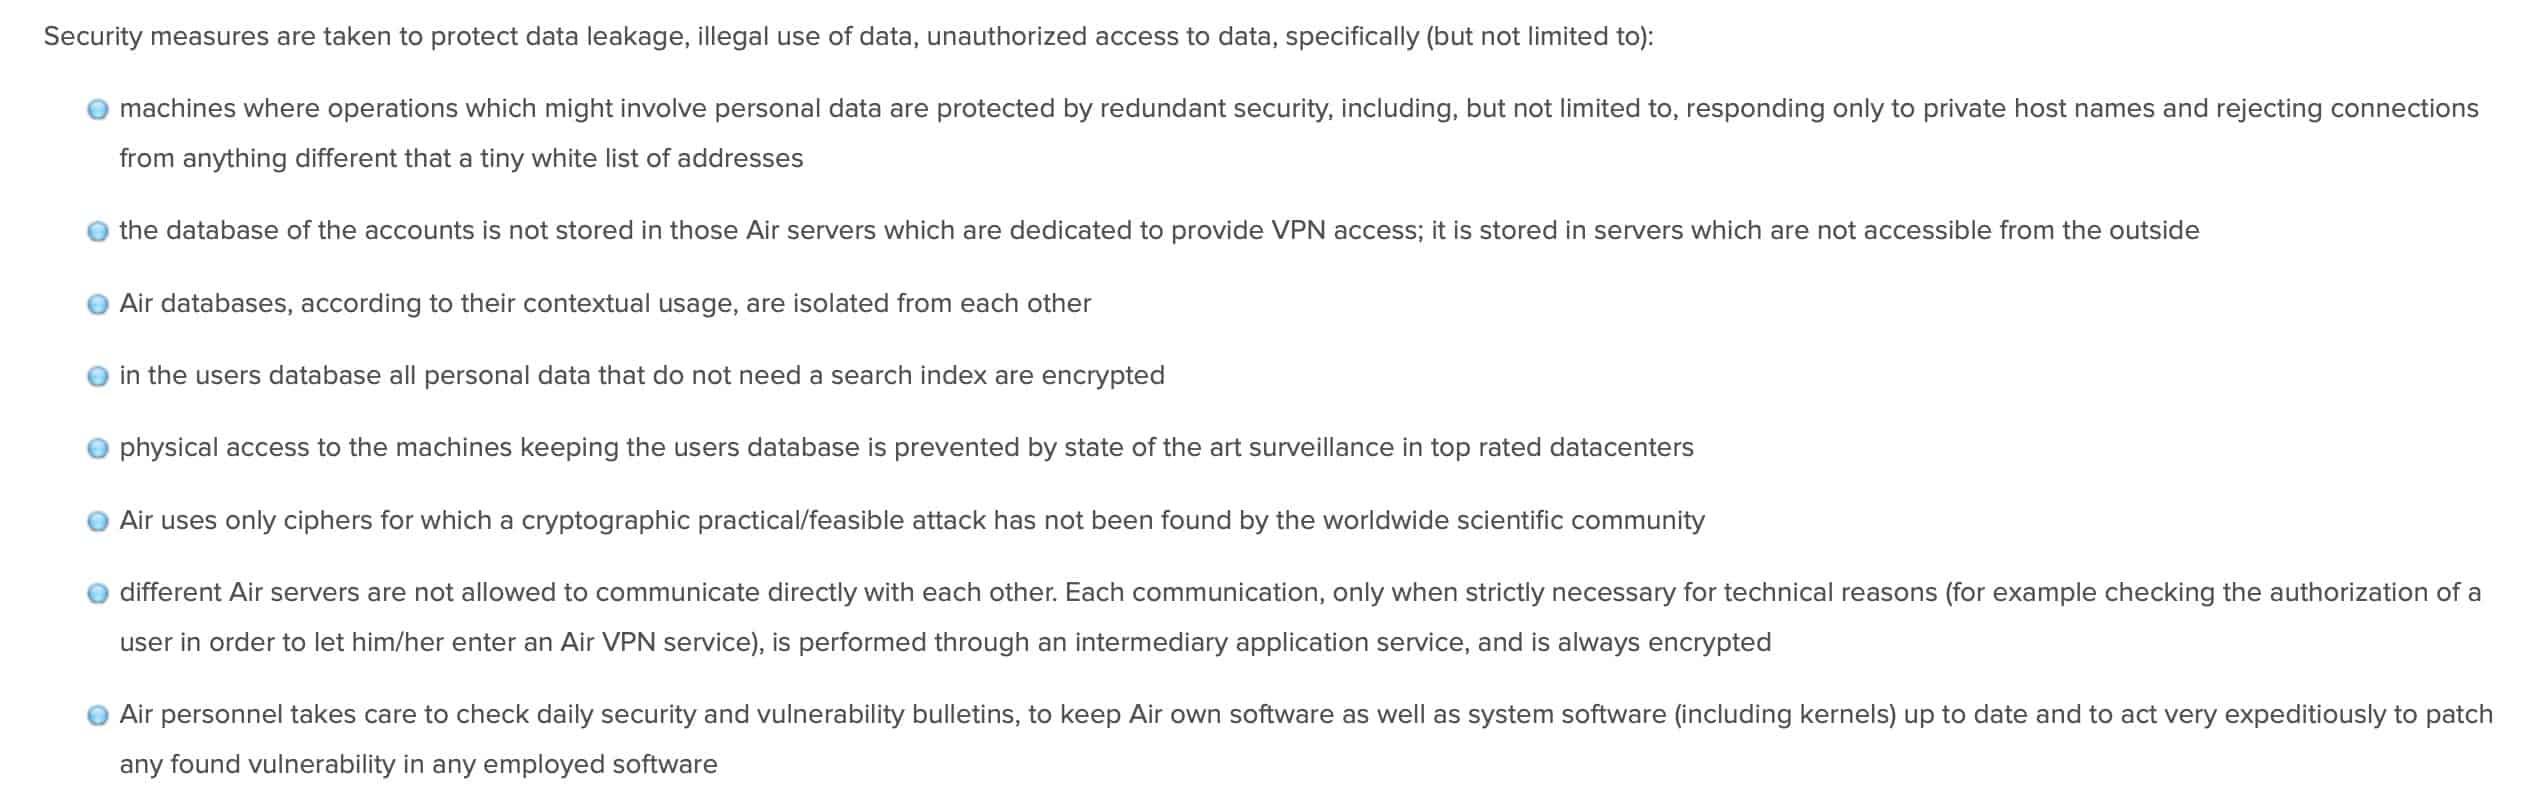 AirVPN - Privacy Policy 3